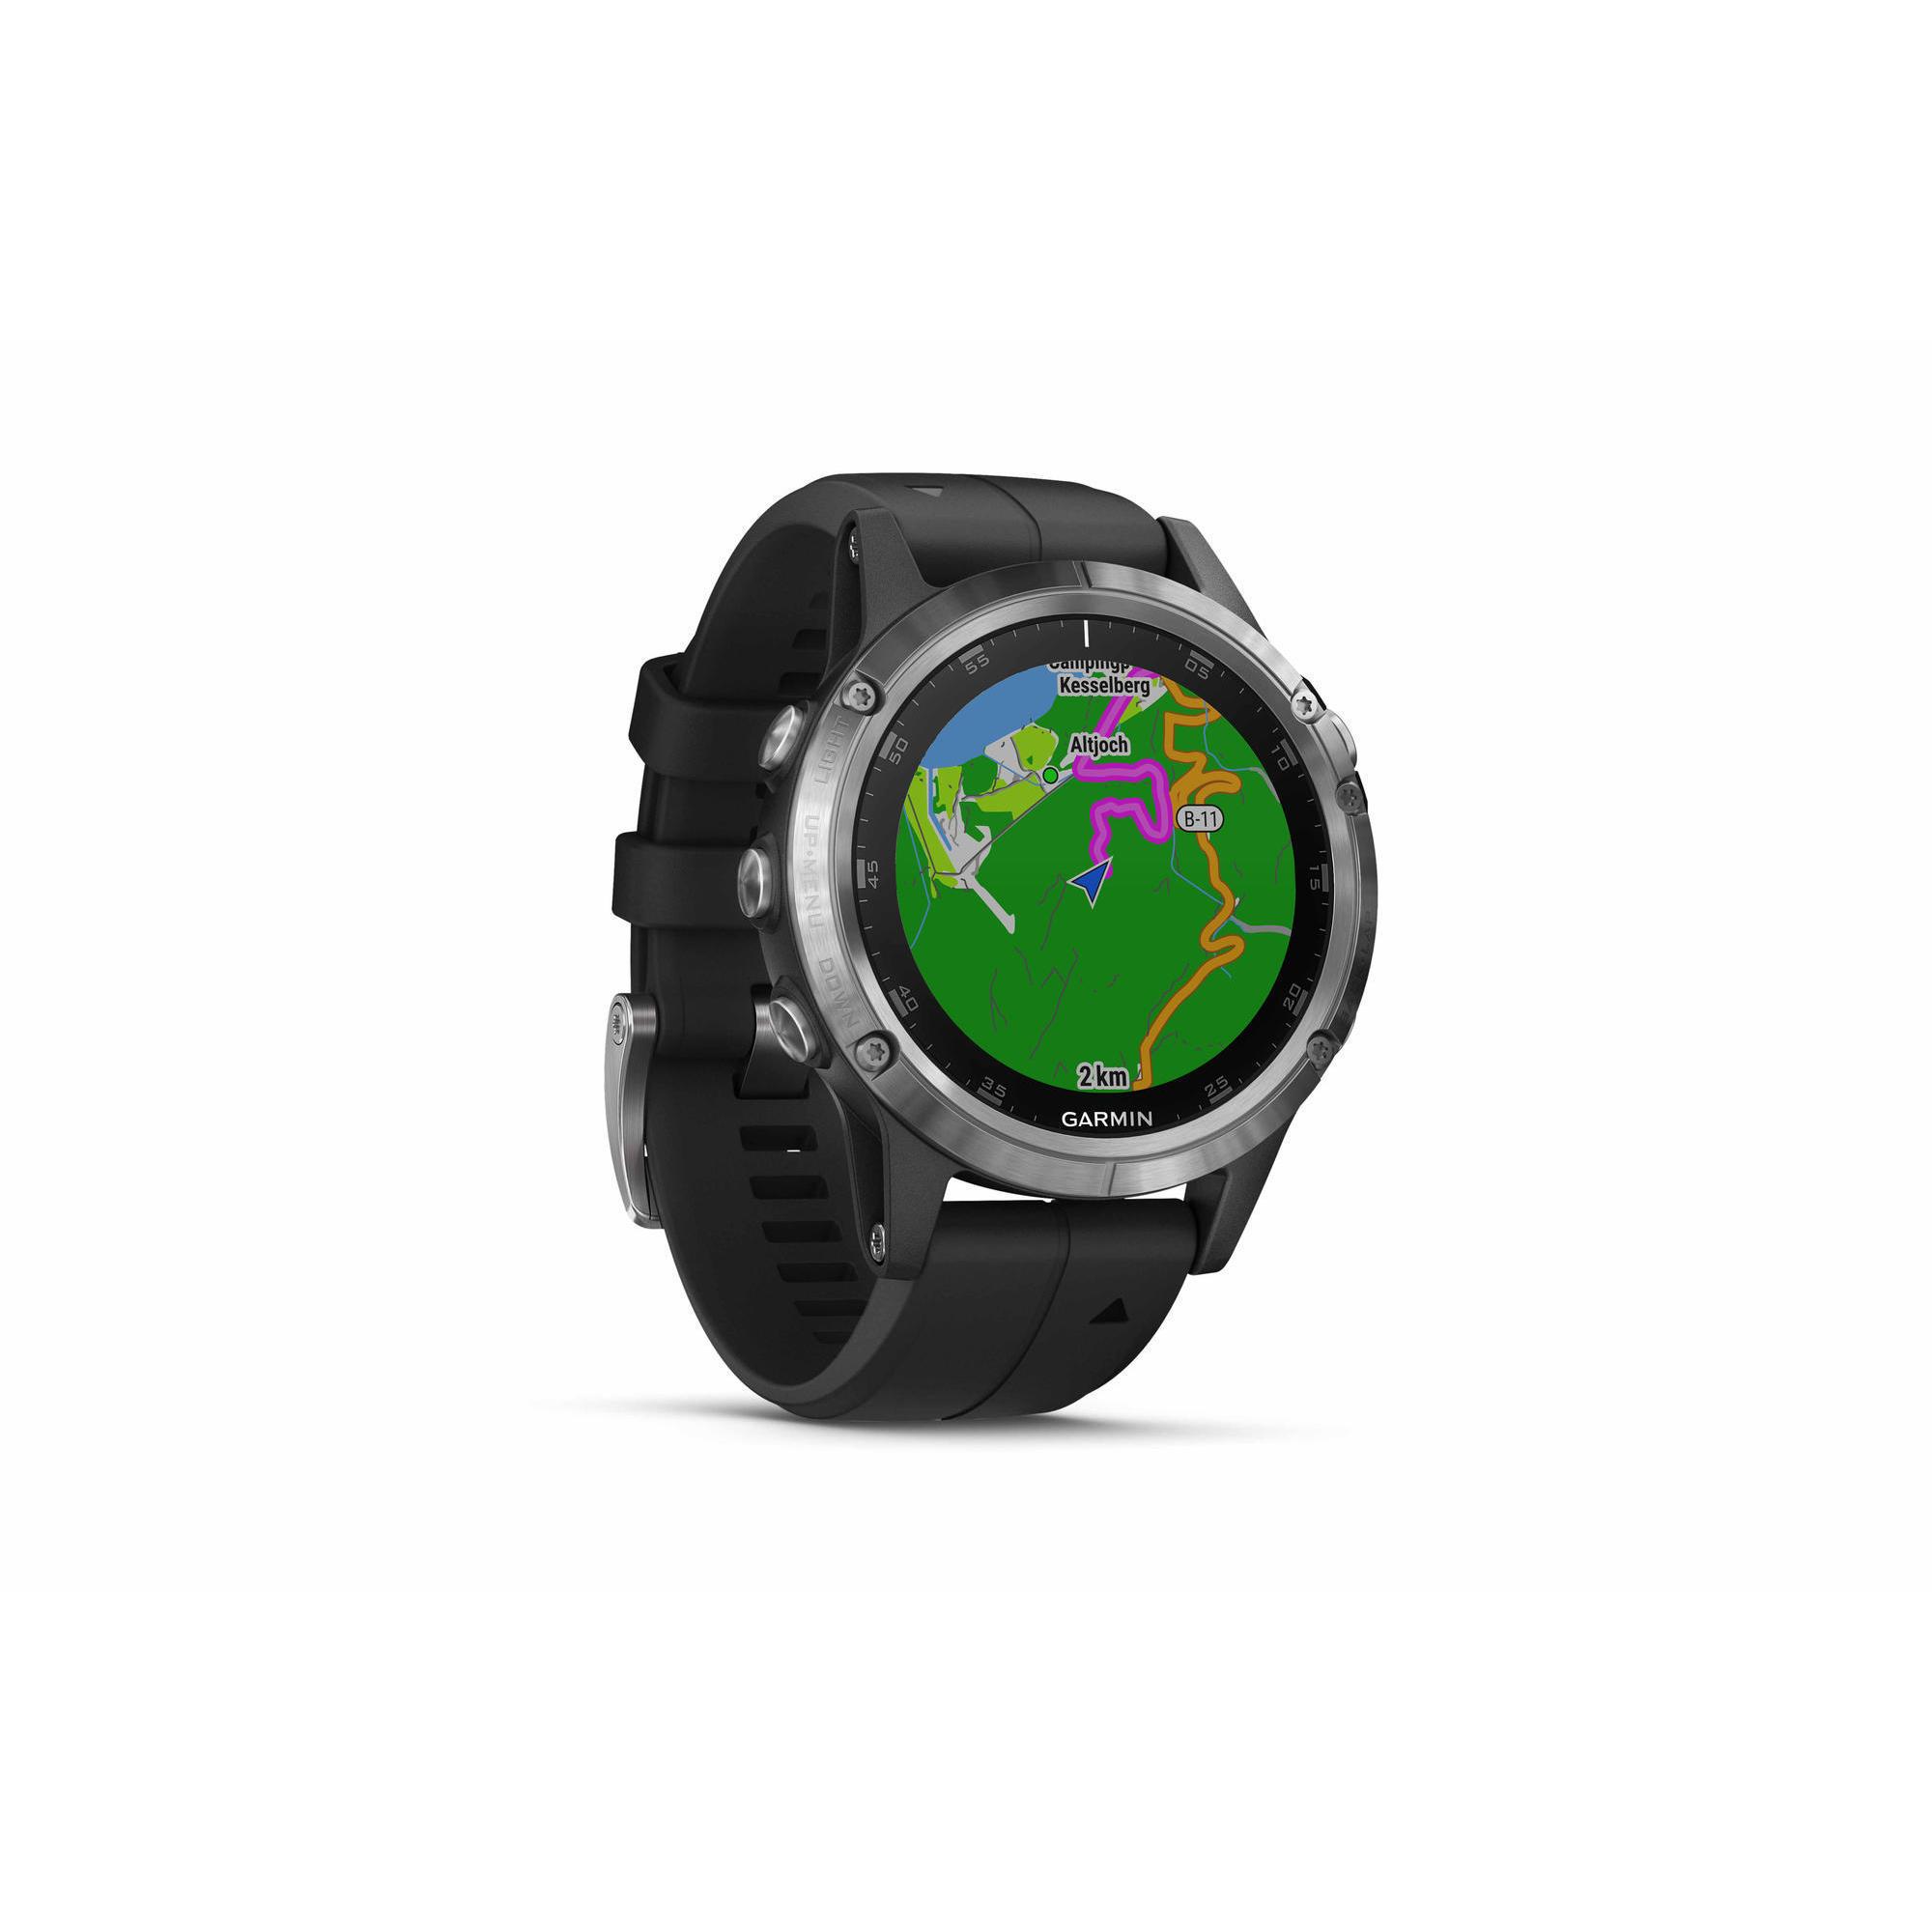 adeefc138fe7 Reloj GPS Multideporte Garmin Fénix 5 Plus Silver pulsómetro en muñeca negro